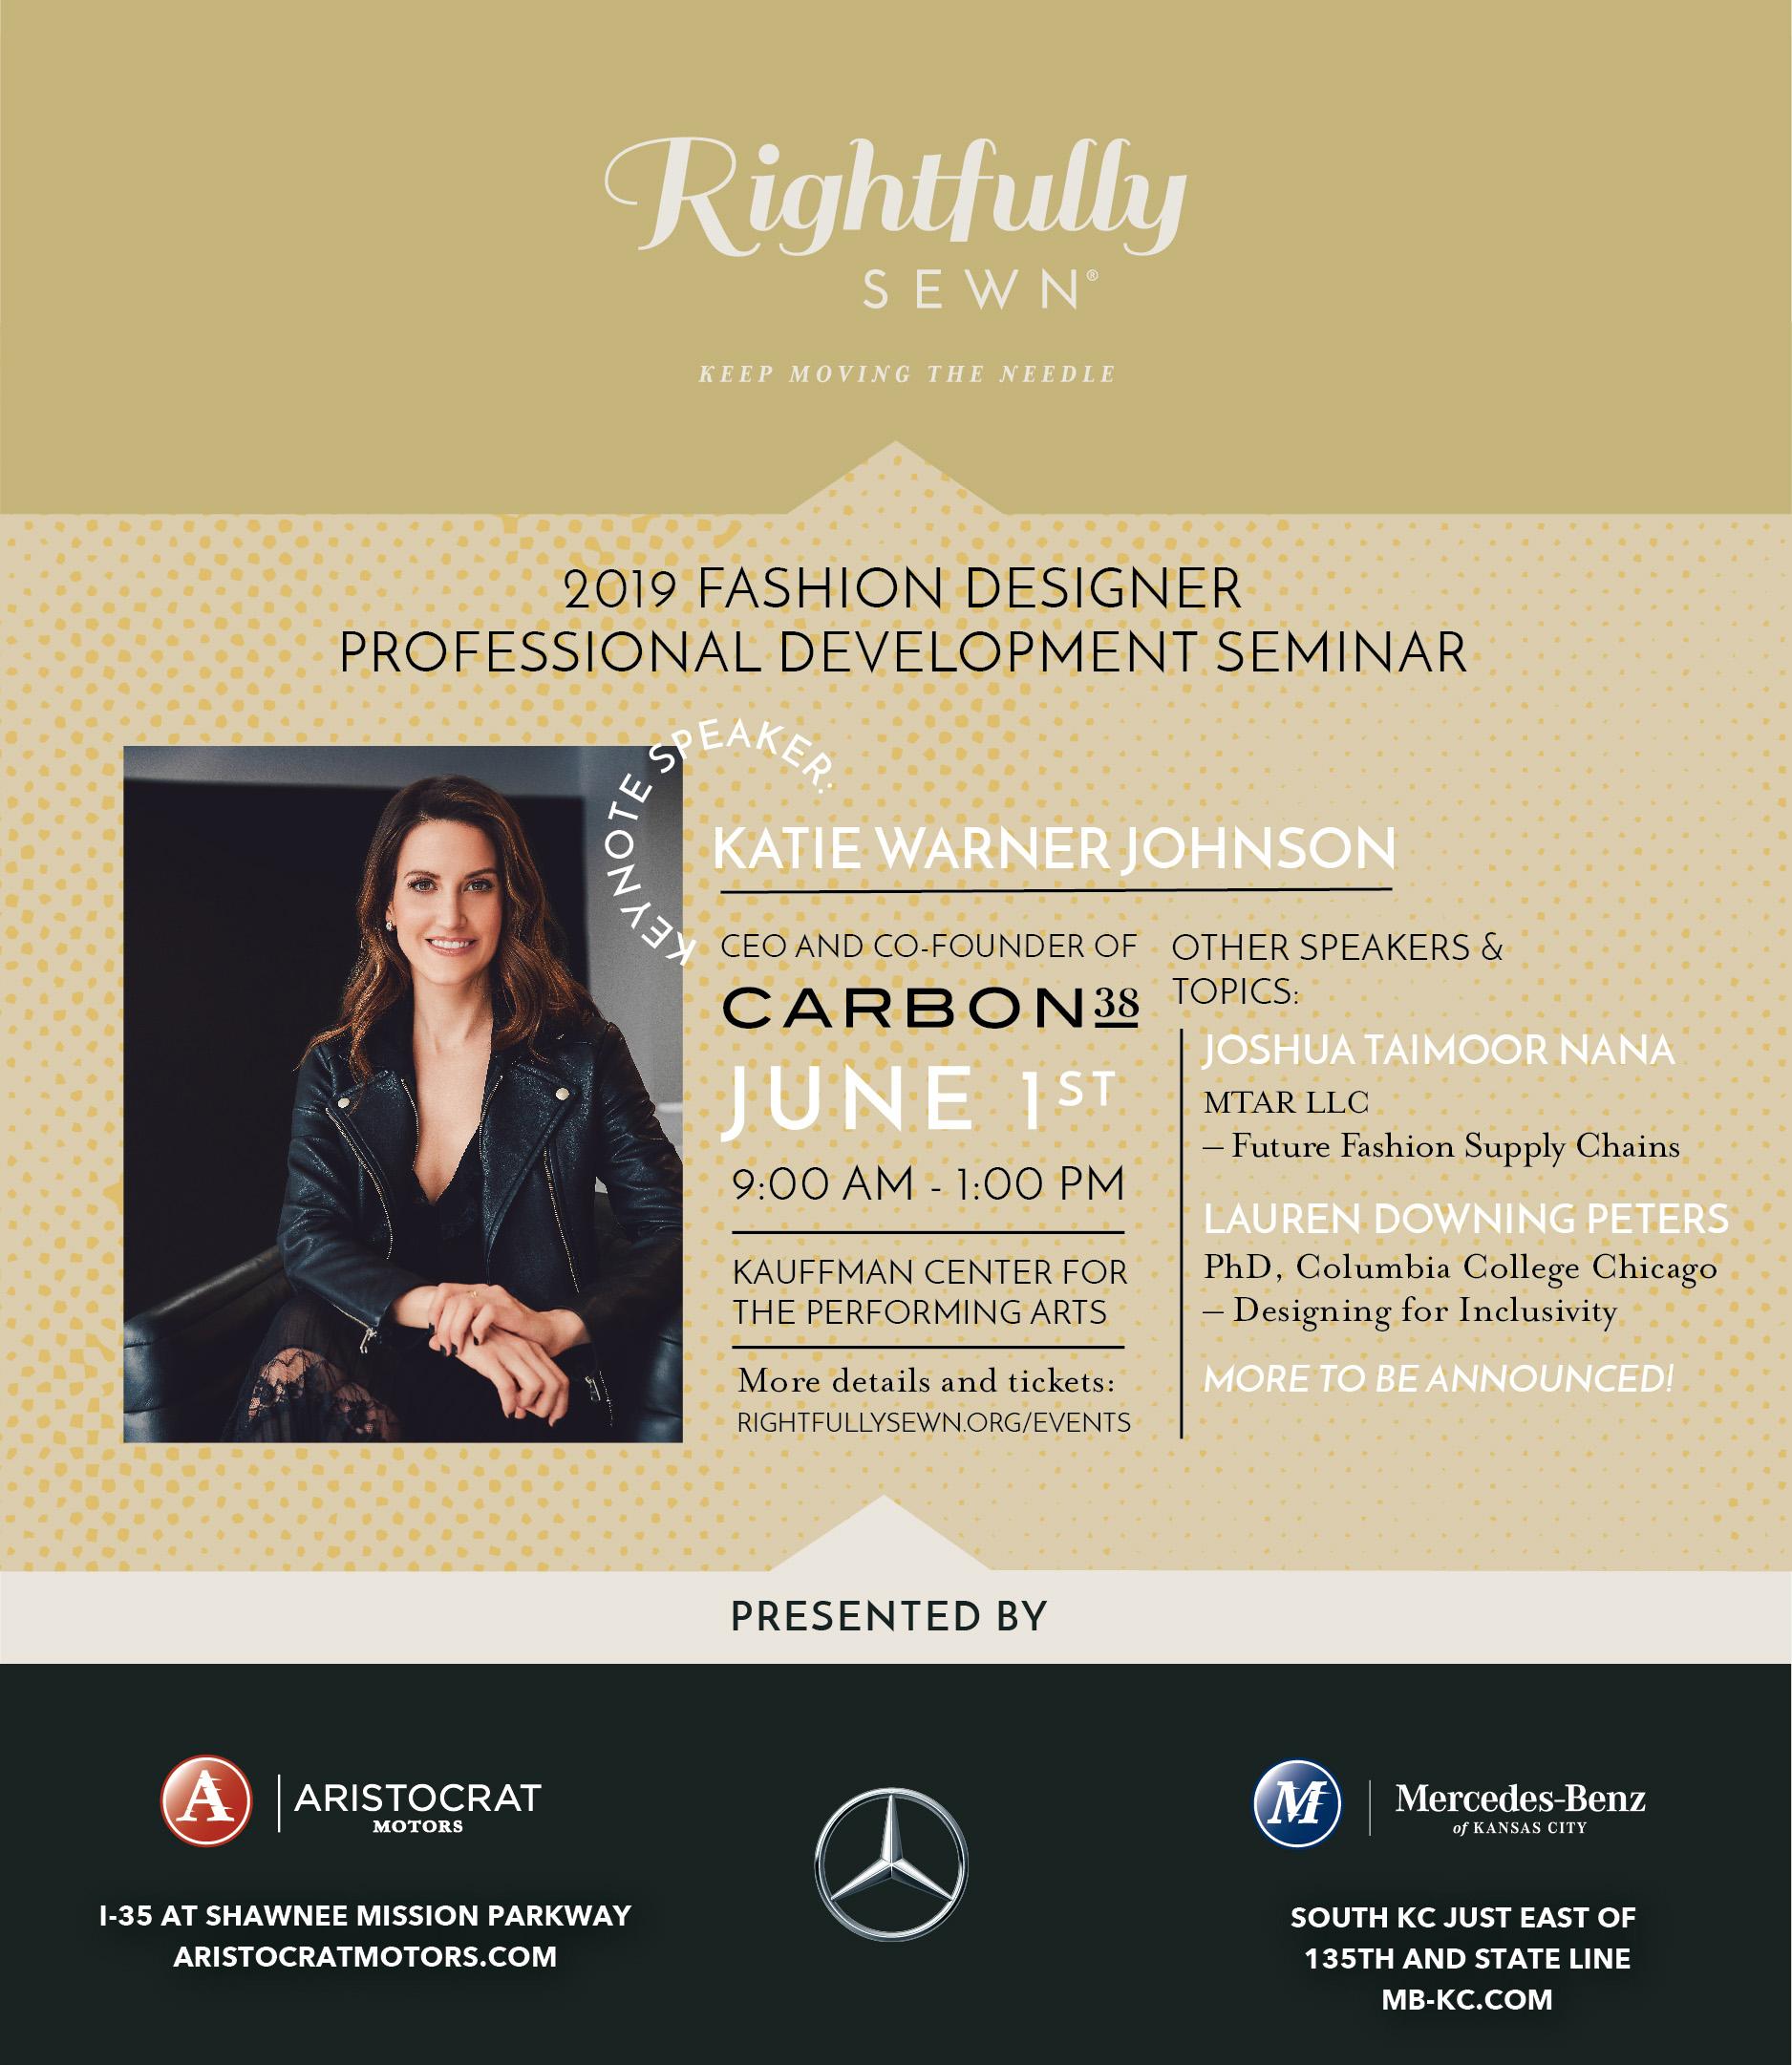 2019 Fashion Designer Professional Development Seminar Rightfully Sewn At Kauffman Center For The Performing Arts Kansas City Mo Art